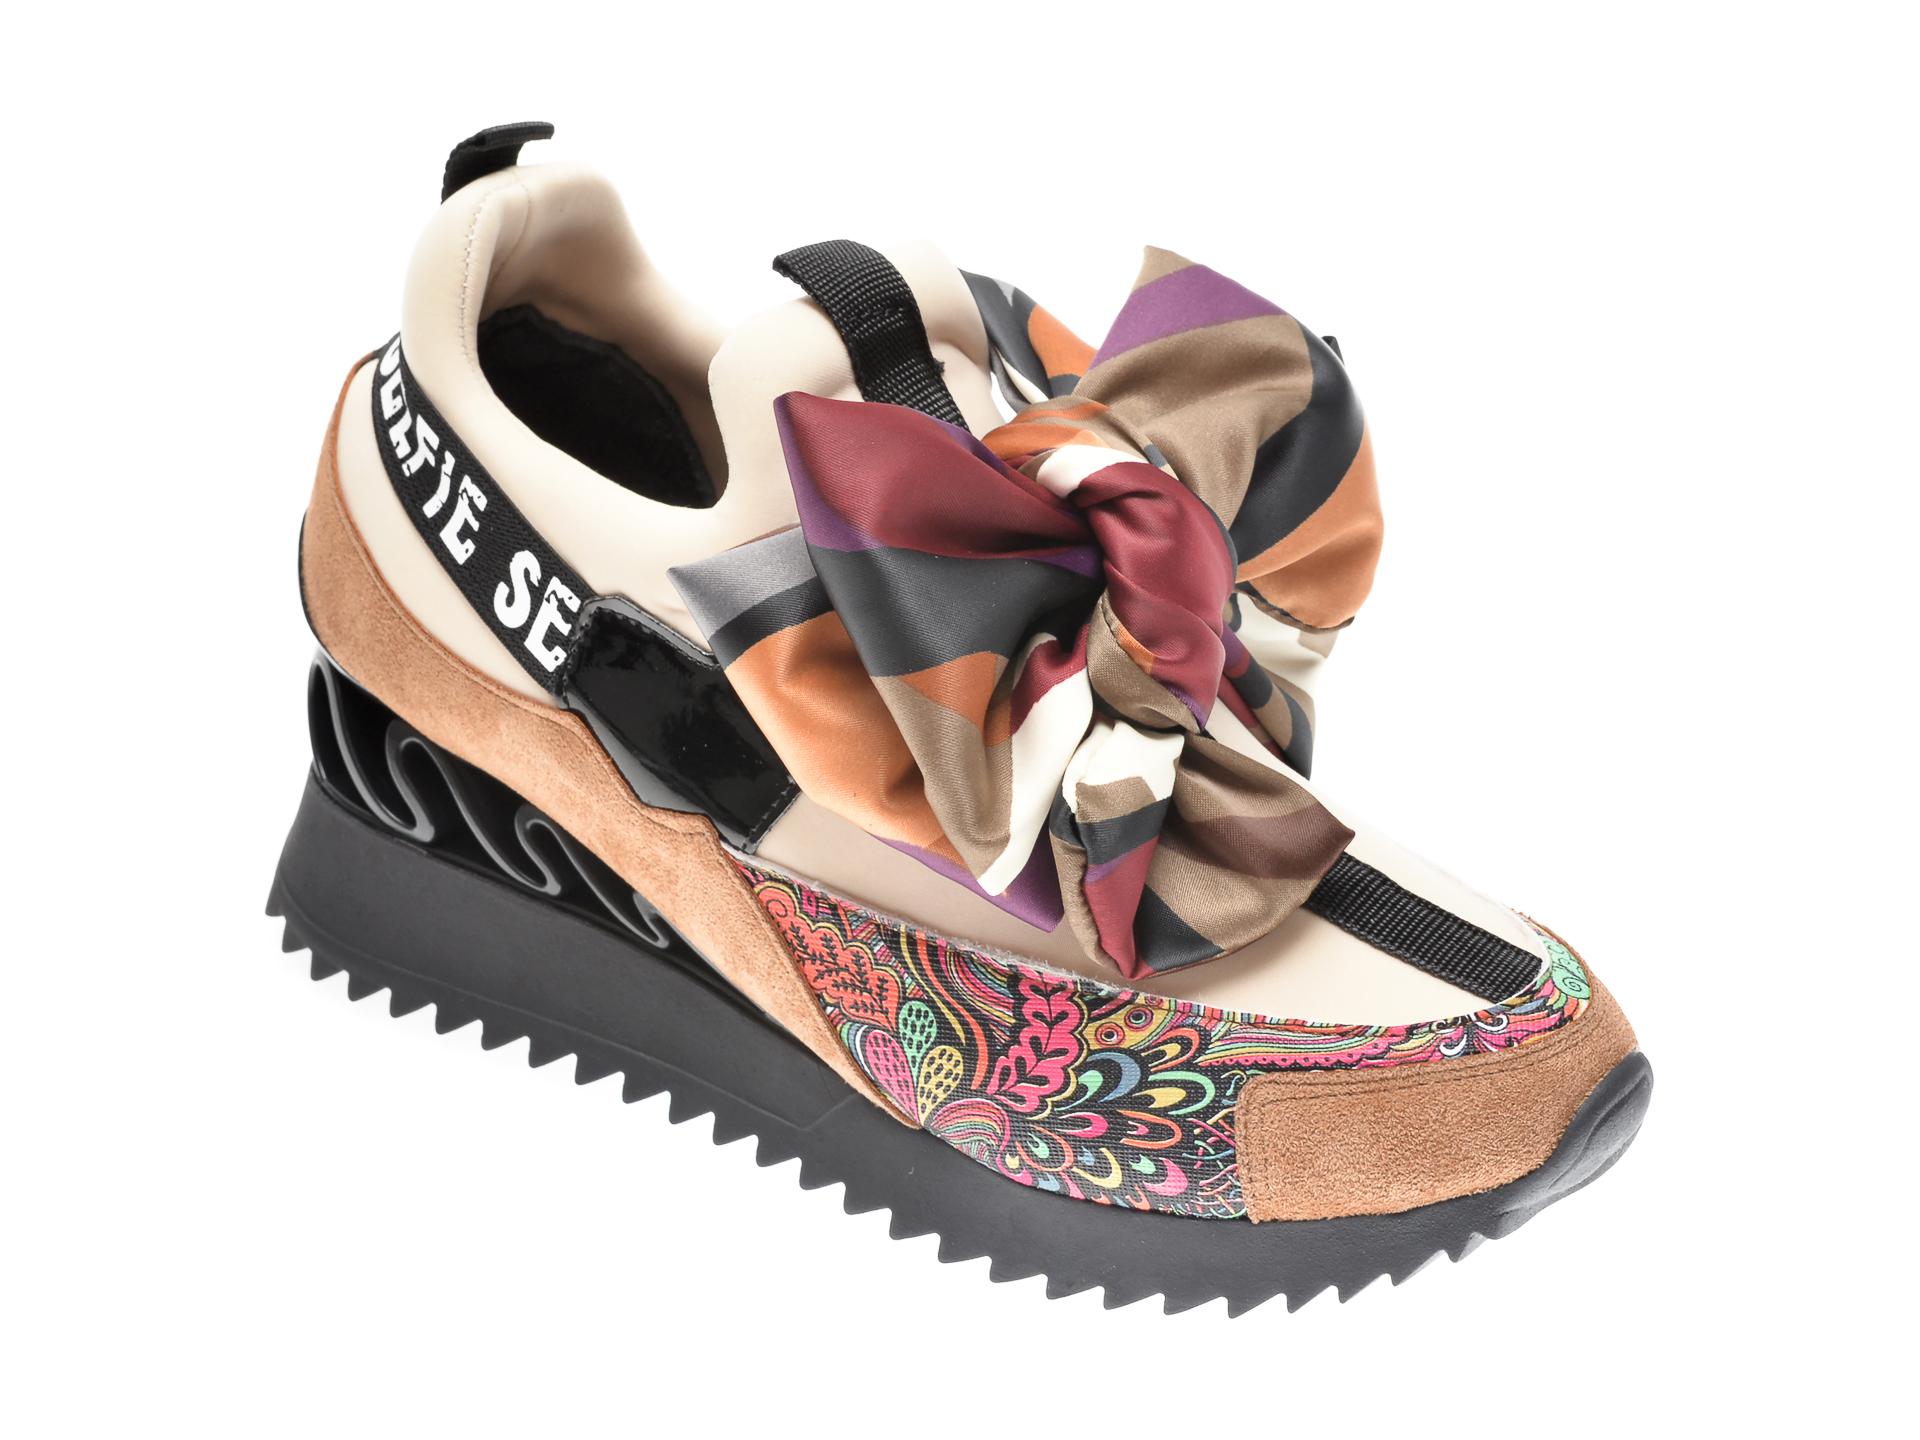 Pantofi sport GRYXX bej, MK8855, din material textil si piele ecologica